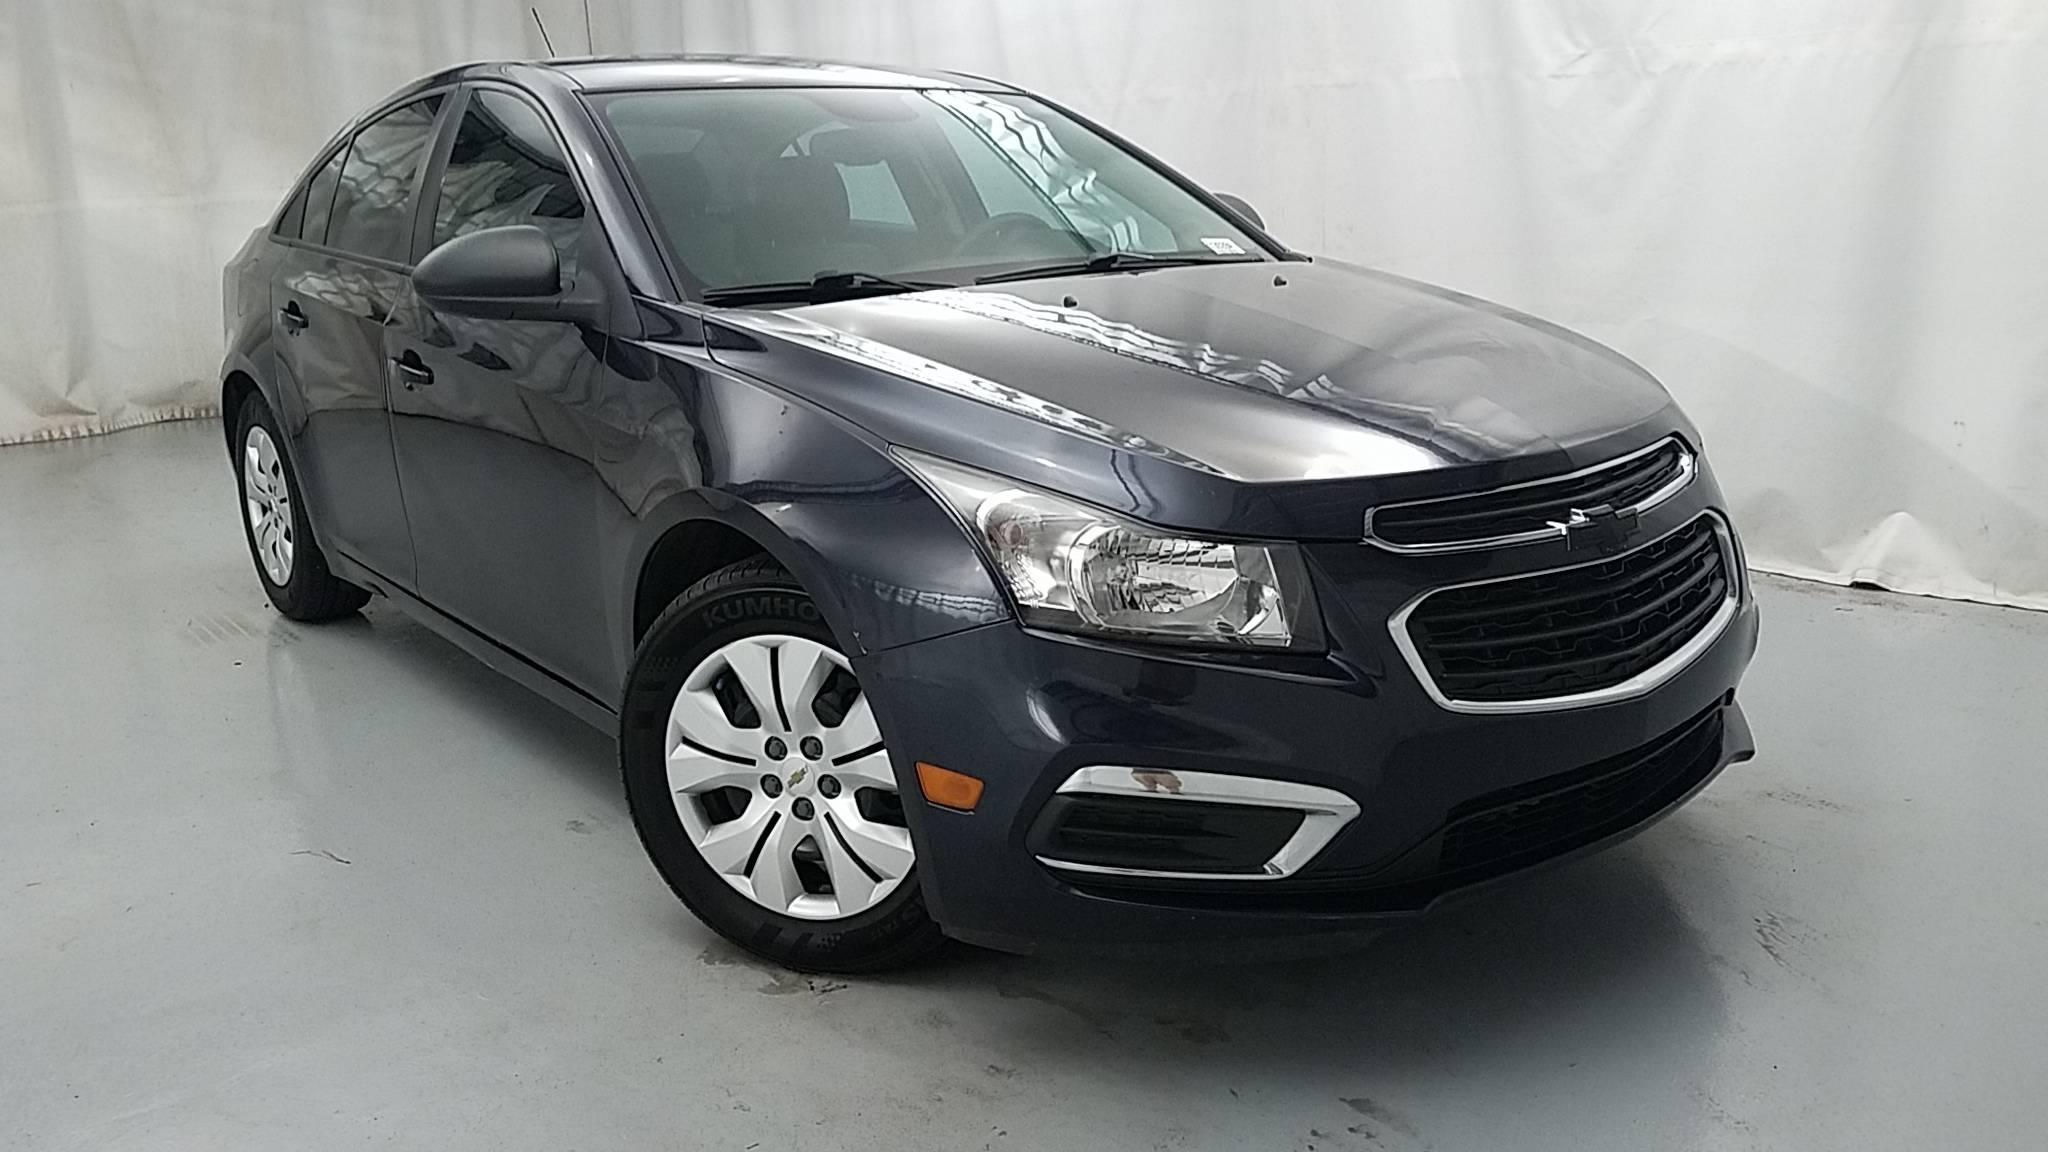 2015 200 Vehicles for Sale in Hammond LA